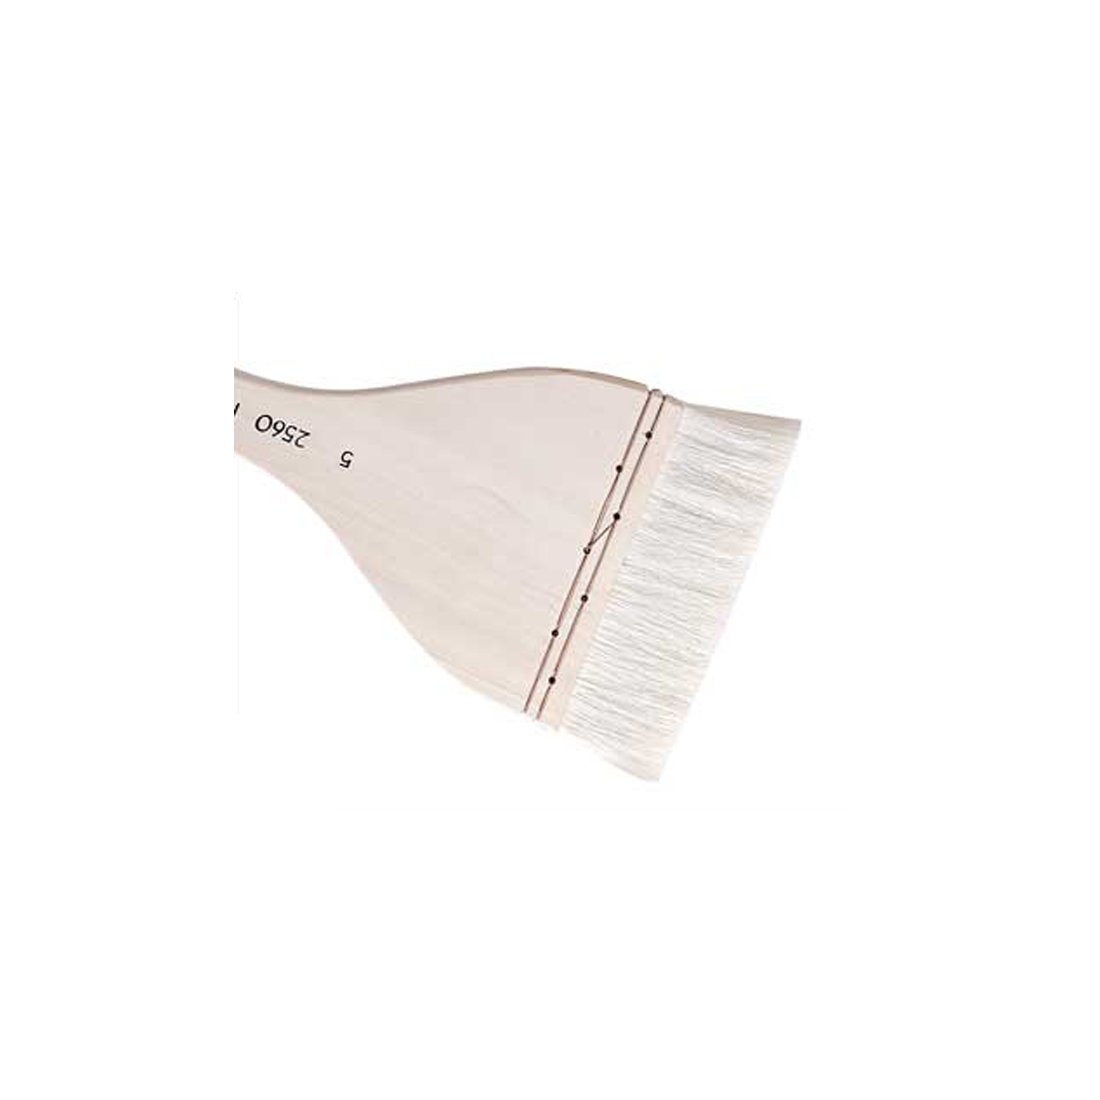 BarFeer Goat Hair Hake Brush Paint Art Brushes Tool Long Wooden Handle Art Supplies Watercolor Brush Pen Size 1